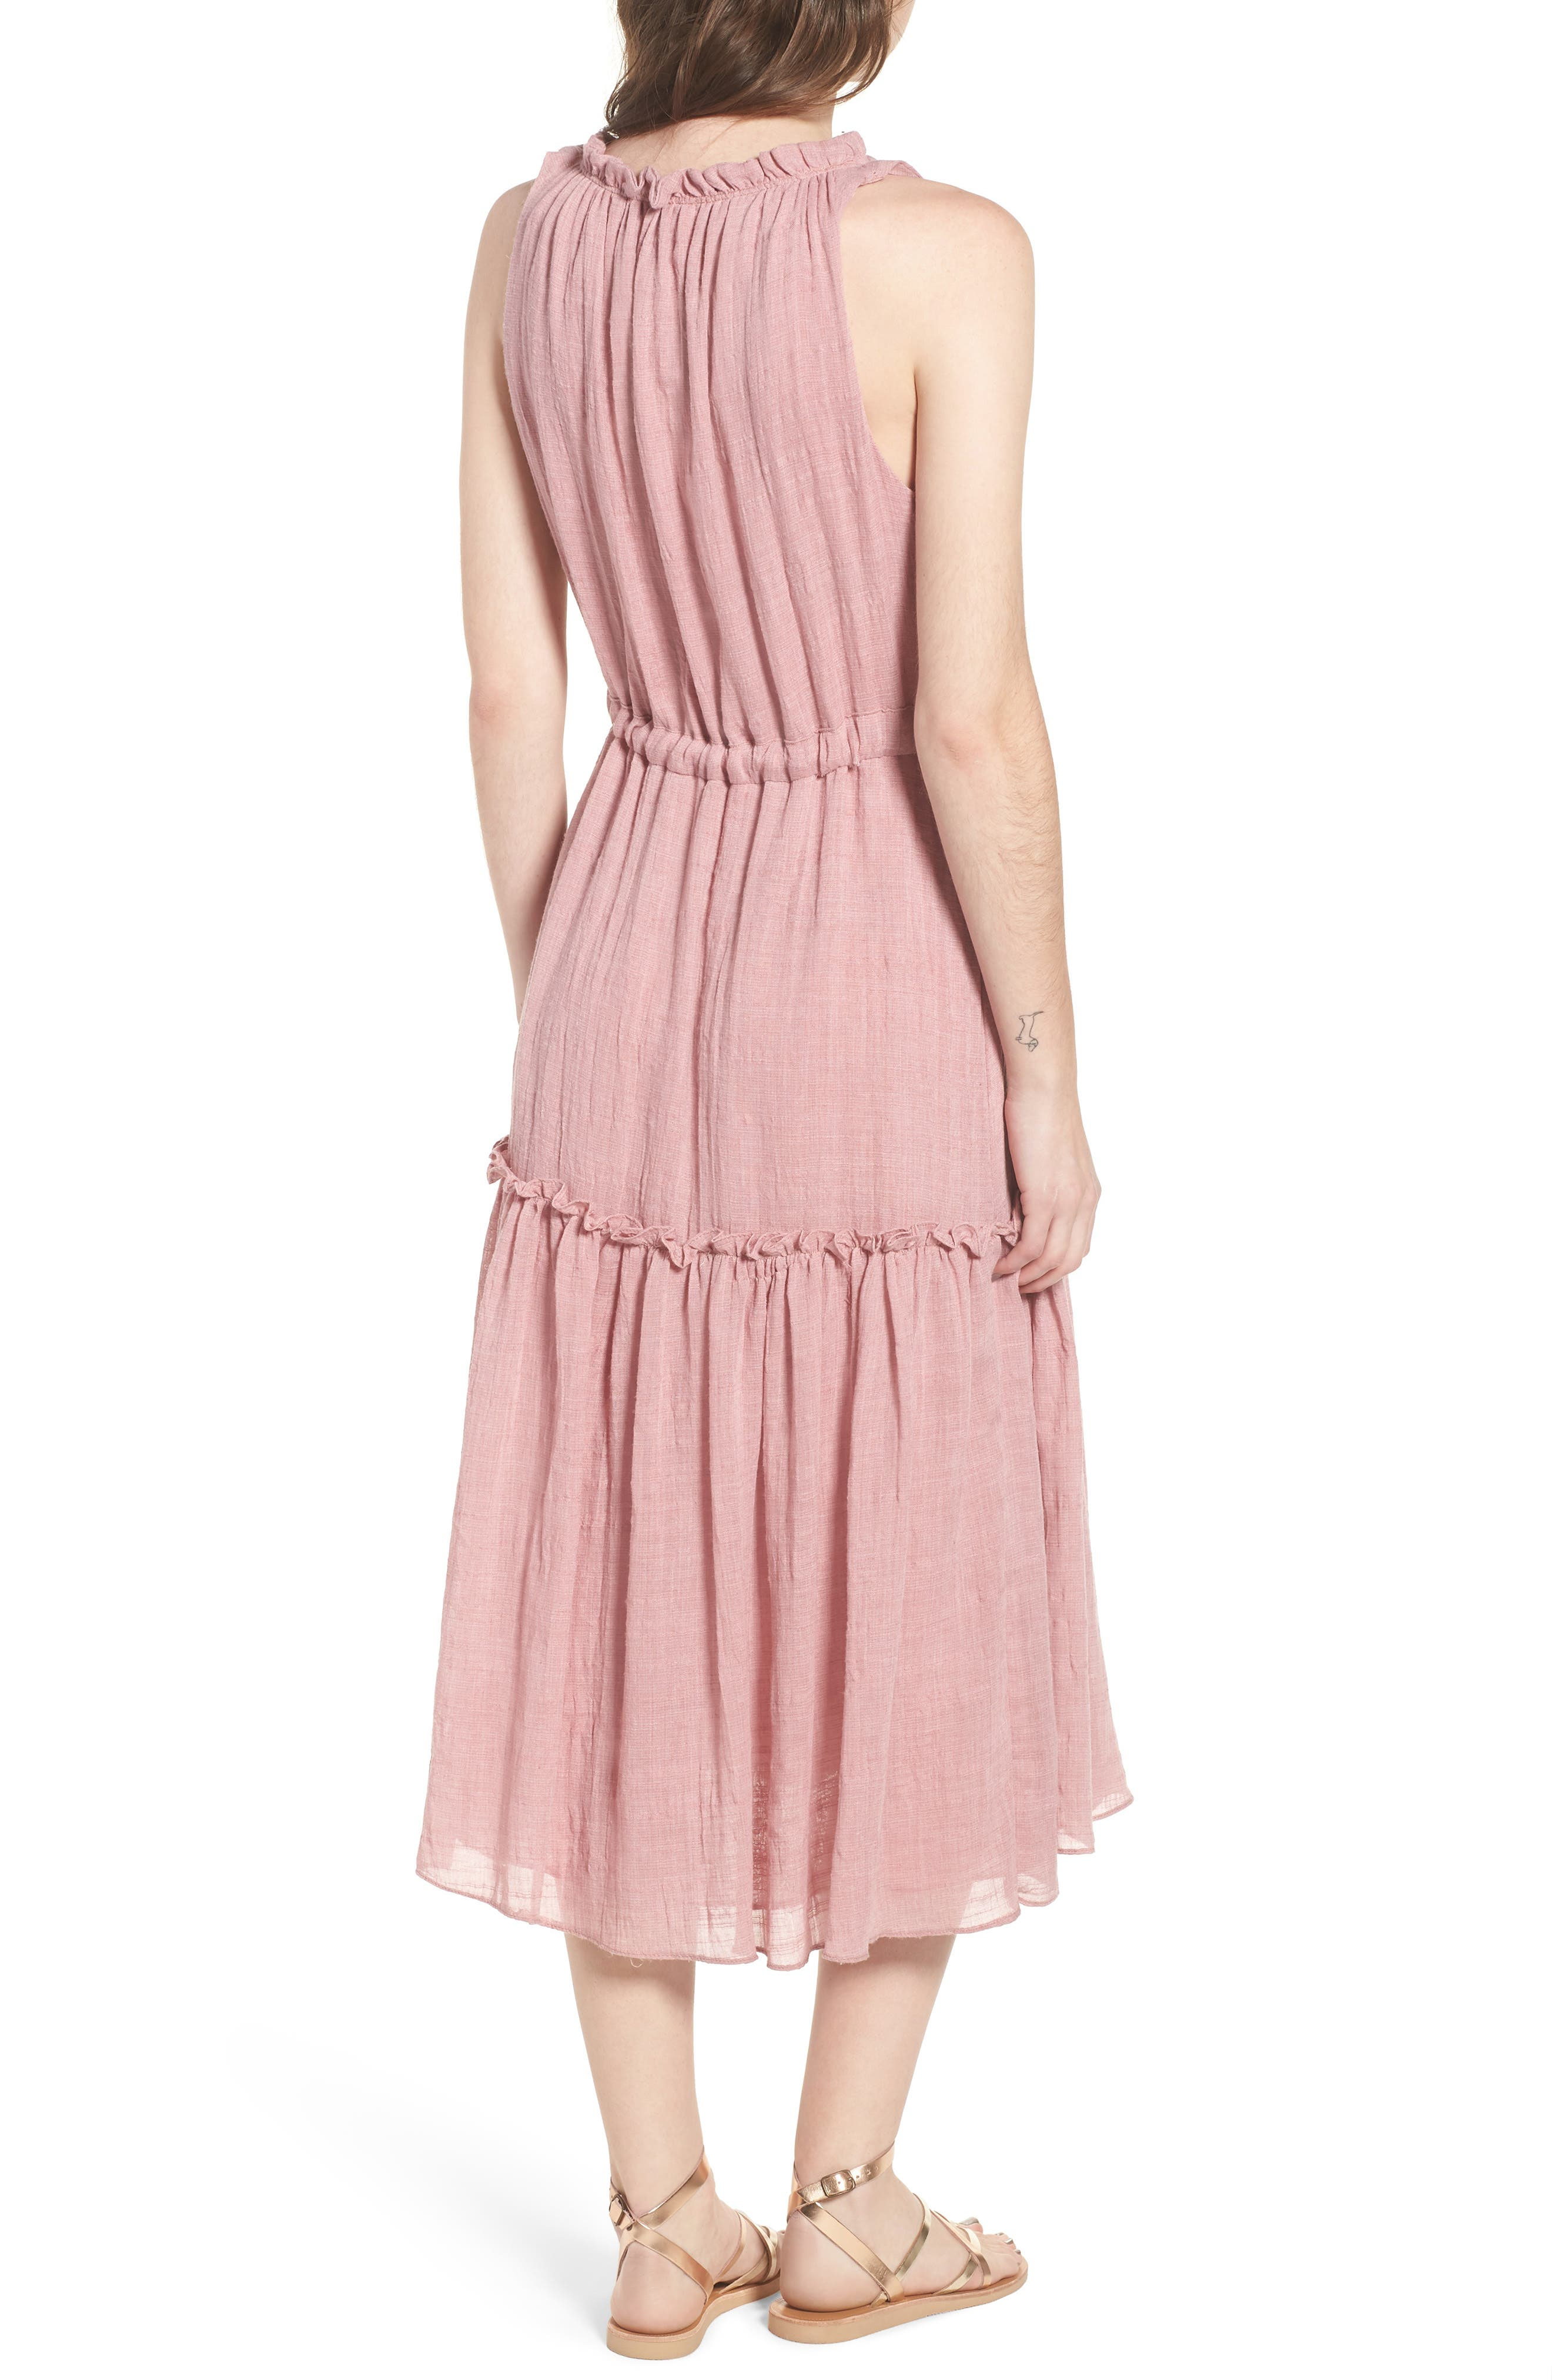 Nicolleta Tie Waist Midi Dress,                             Alternate thumbnail 2, color,                             650